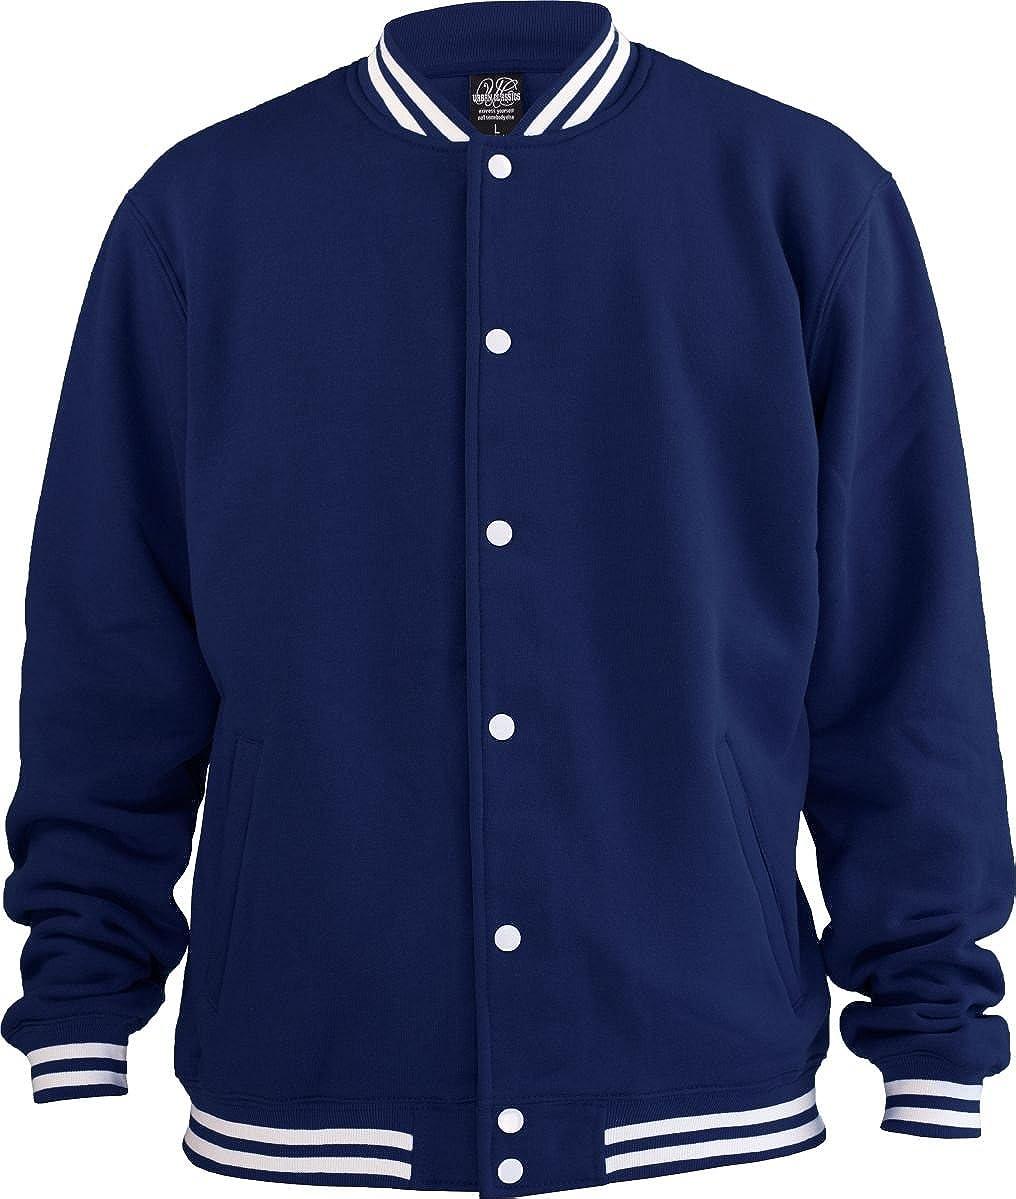 College Sweatjacket - Navy Urban Classics Jacke